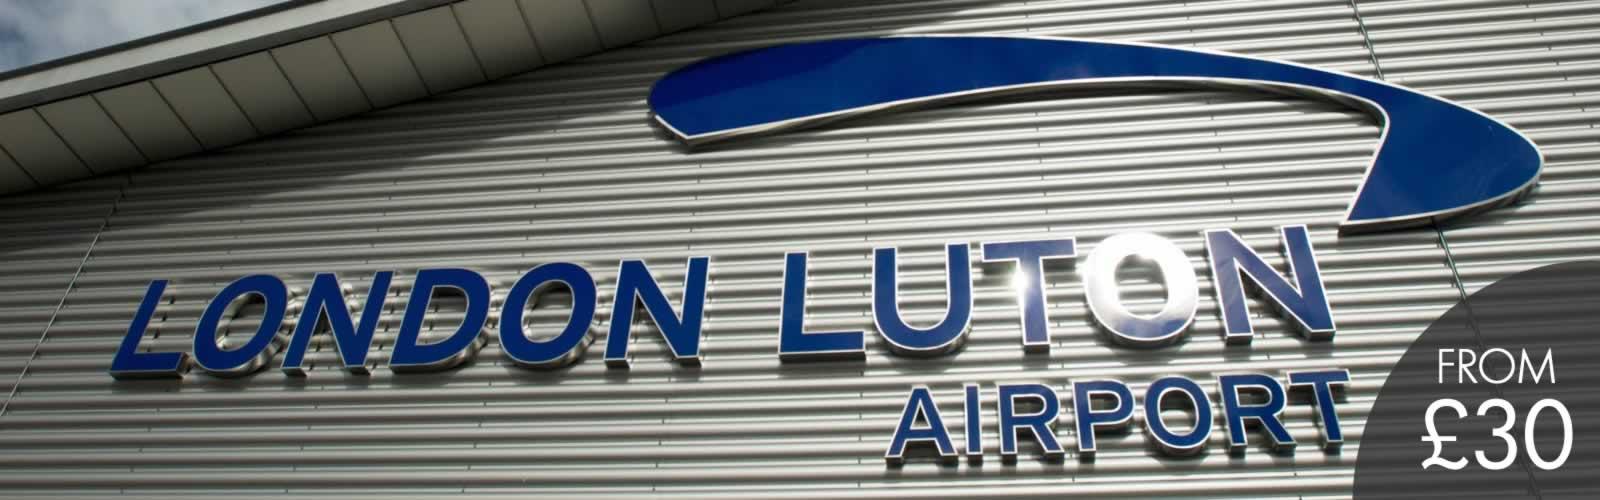 Luton Airport Transfers Leighton Buzzard